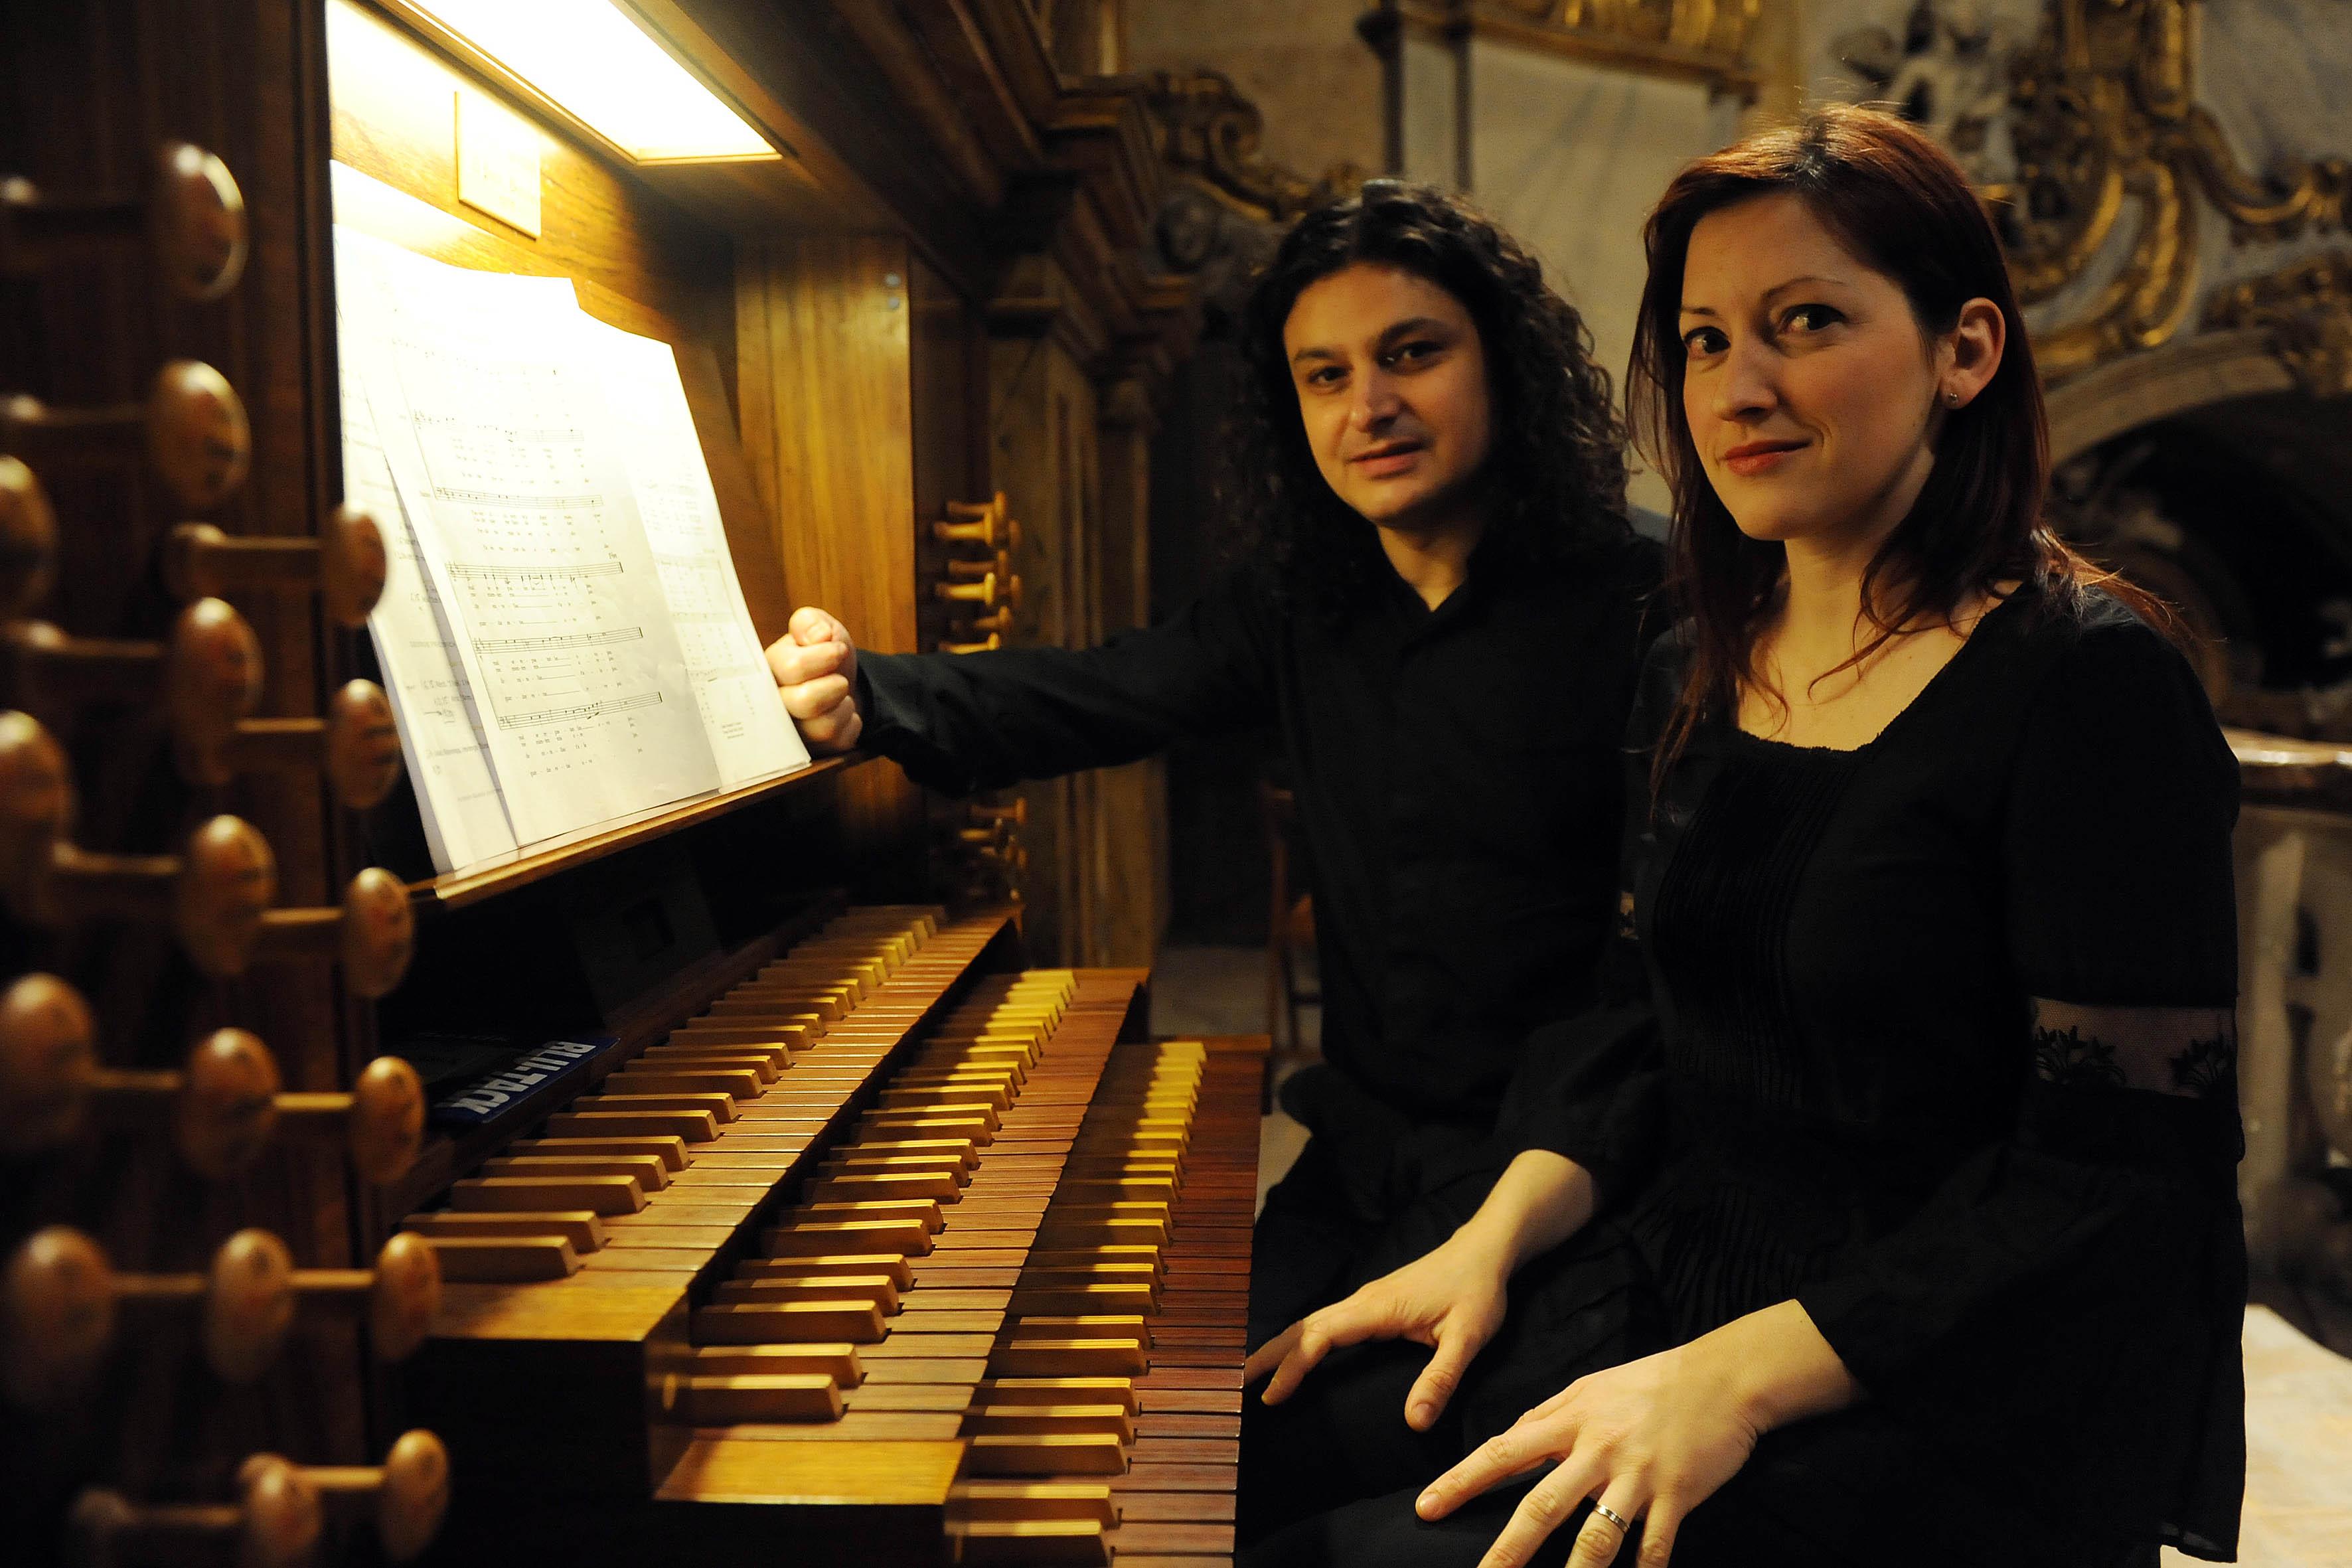 Voice and organ recital. XXl Festival de Arte Sacro de Madrid